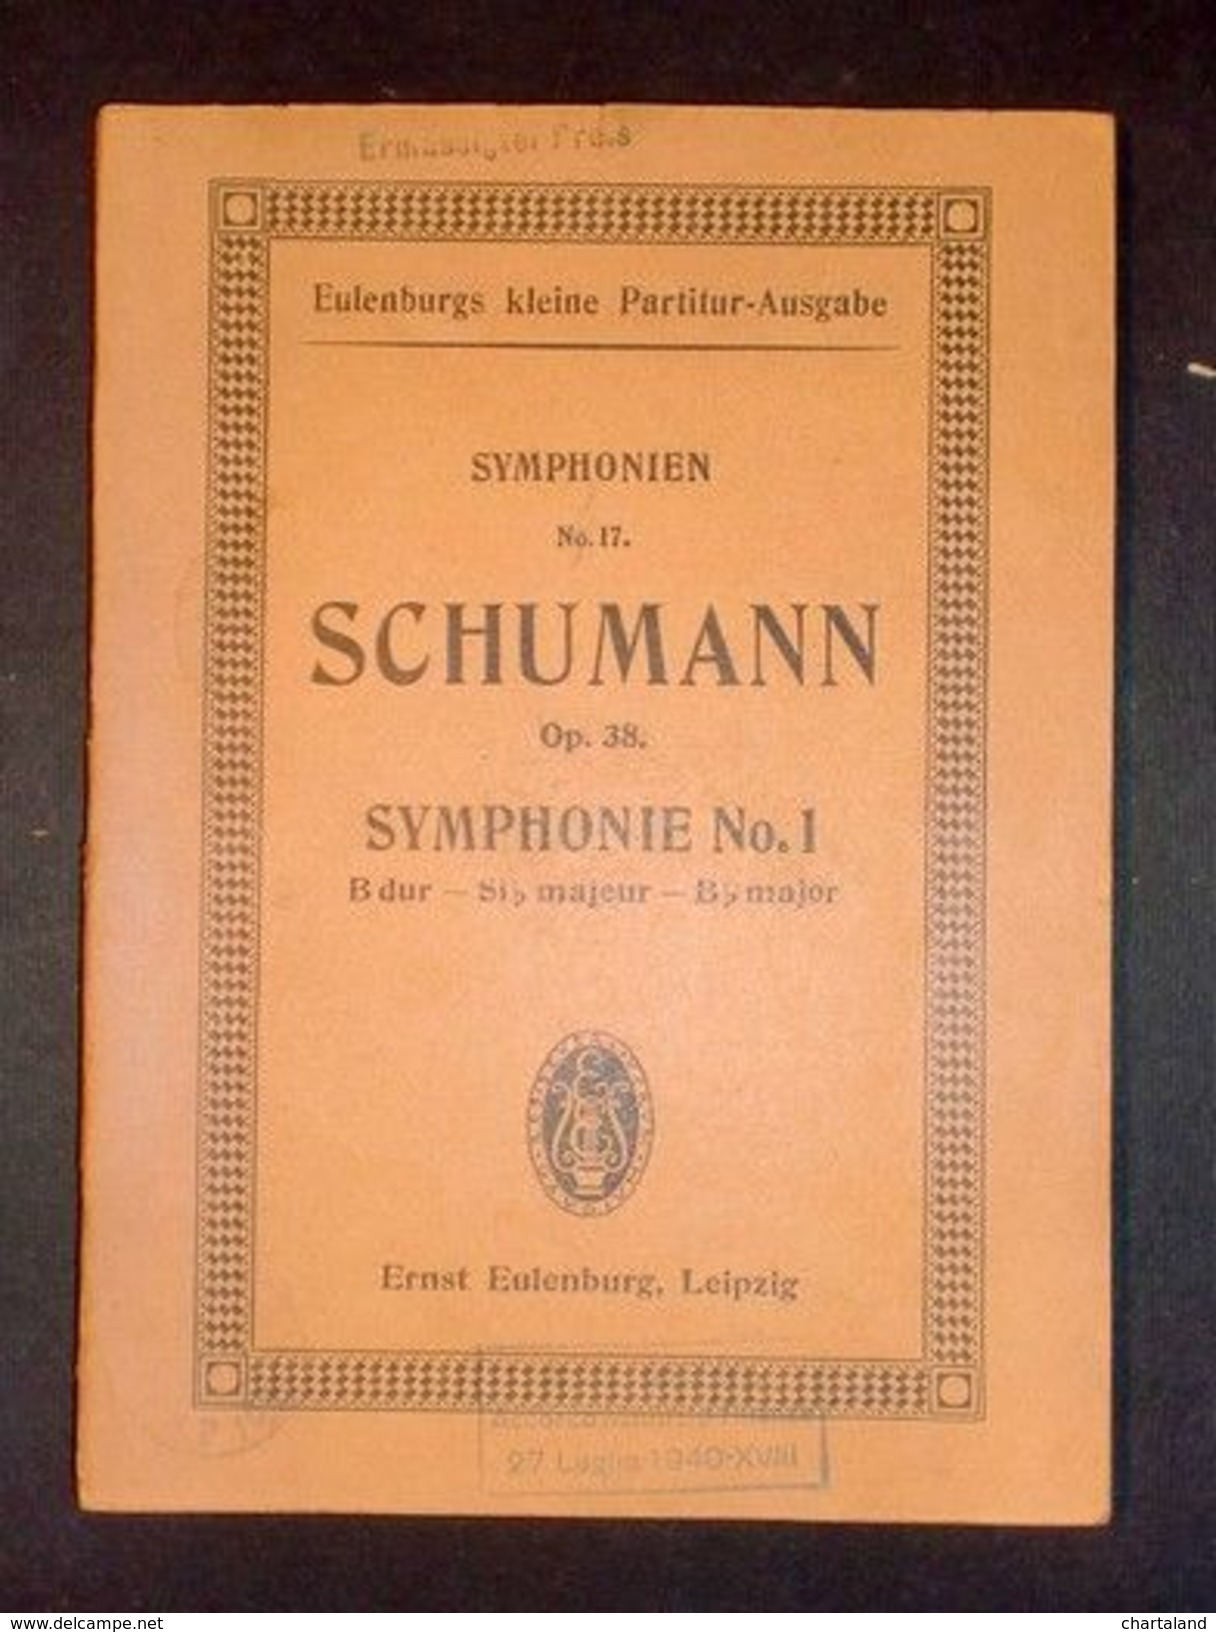 Spartito Partitura - Eulenburgs Kleine Partitur - Schumann Symphonie No. 1 - Vecchi Documenti